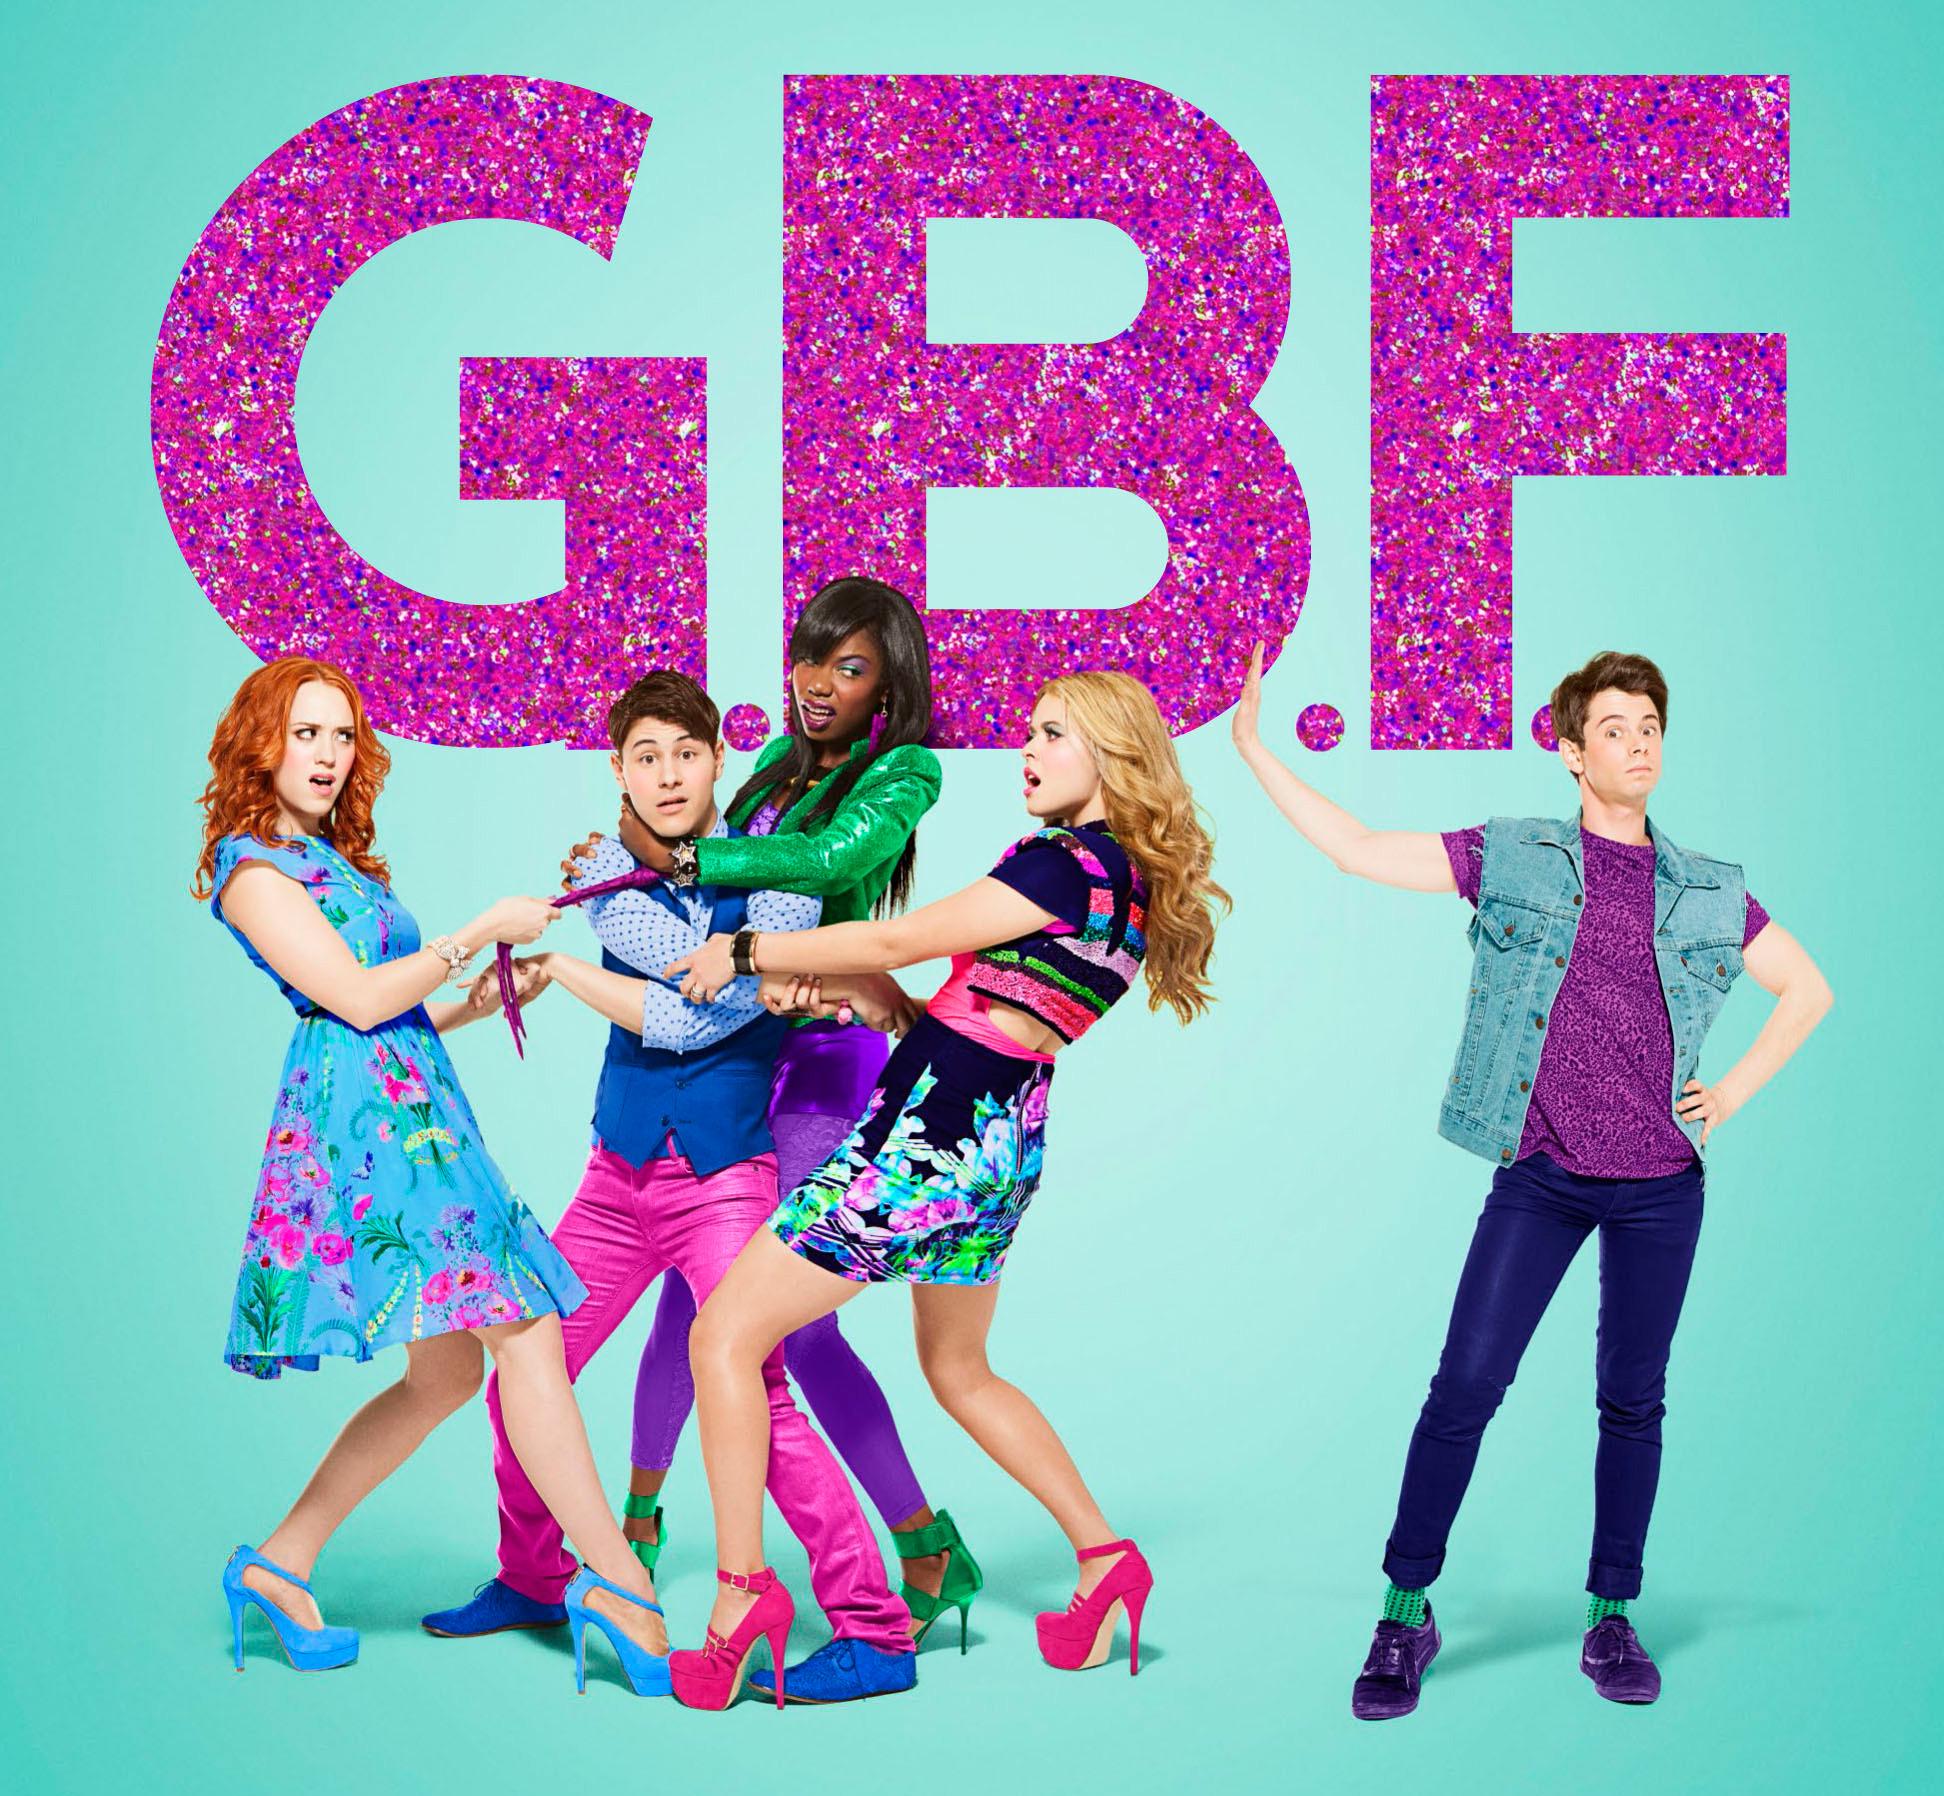 Opening Night 2014: GBF